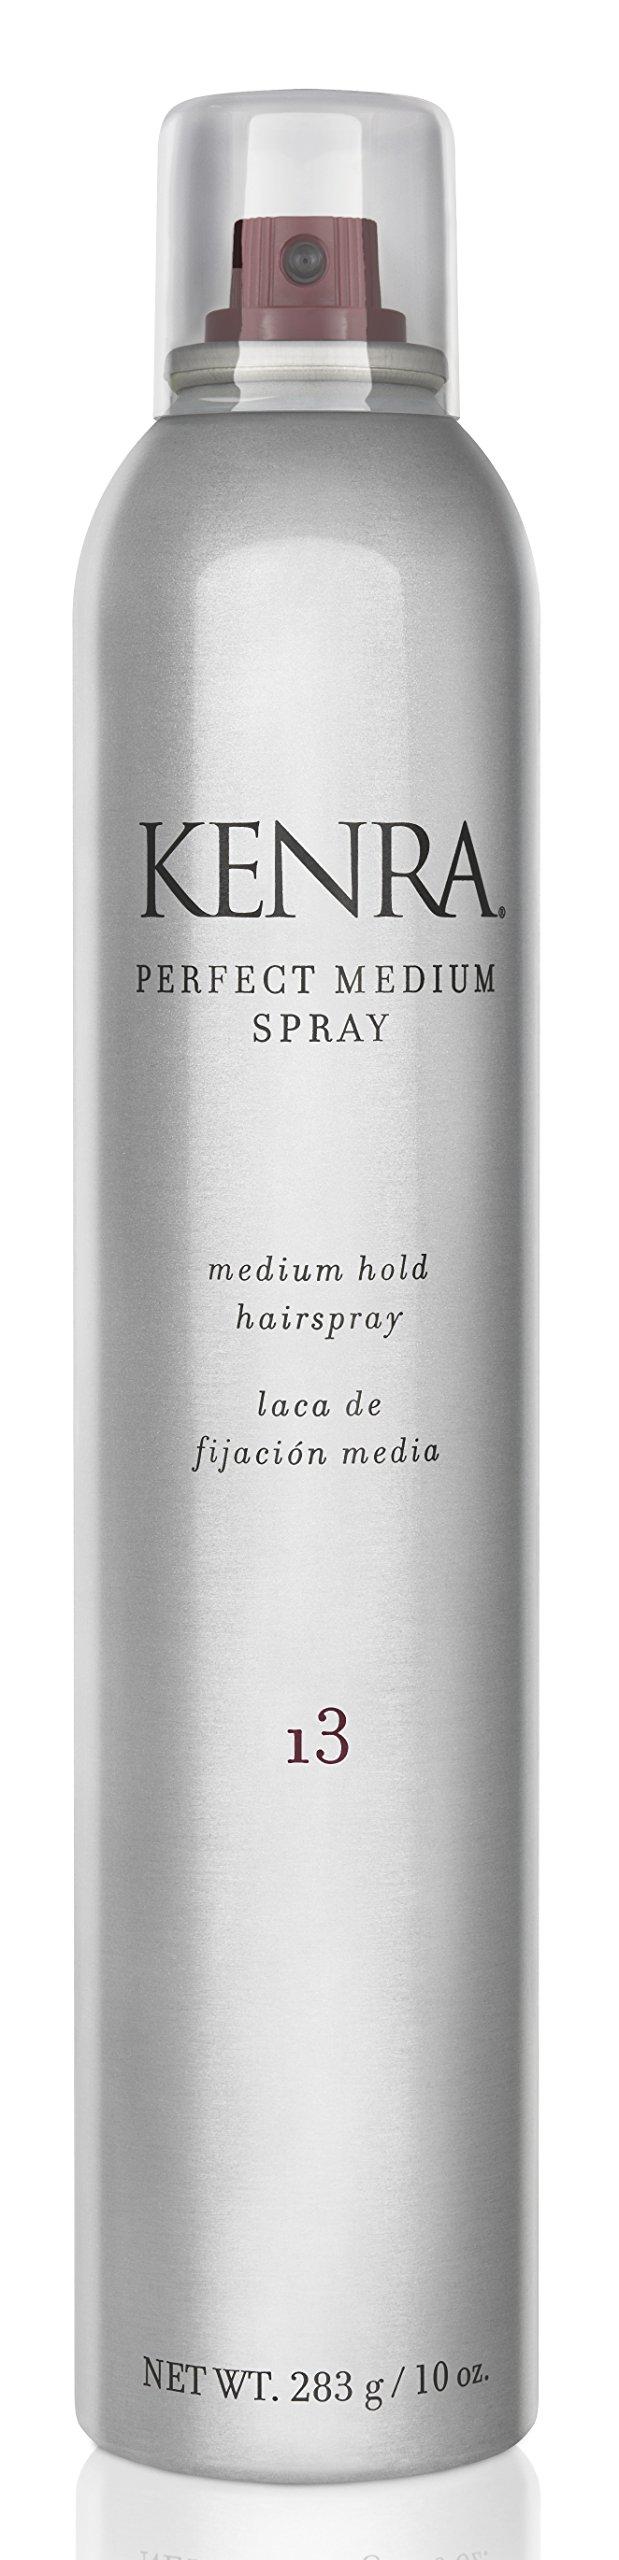 Kenra Perfect Medium Hair Spray #13, 55% VOC, 10-Ounce by Kenra